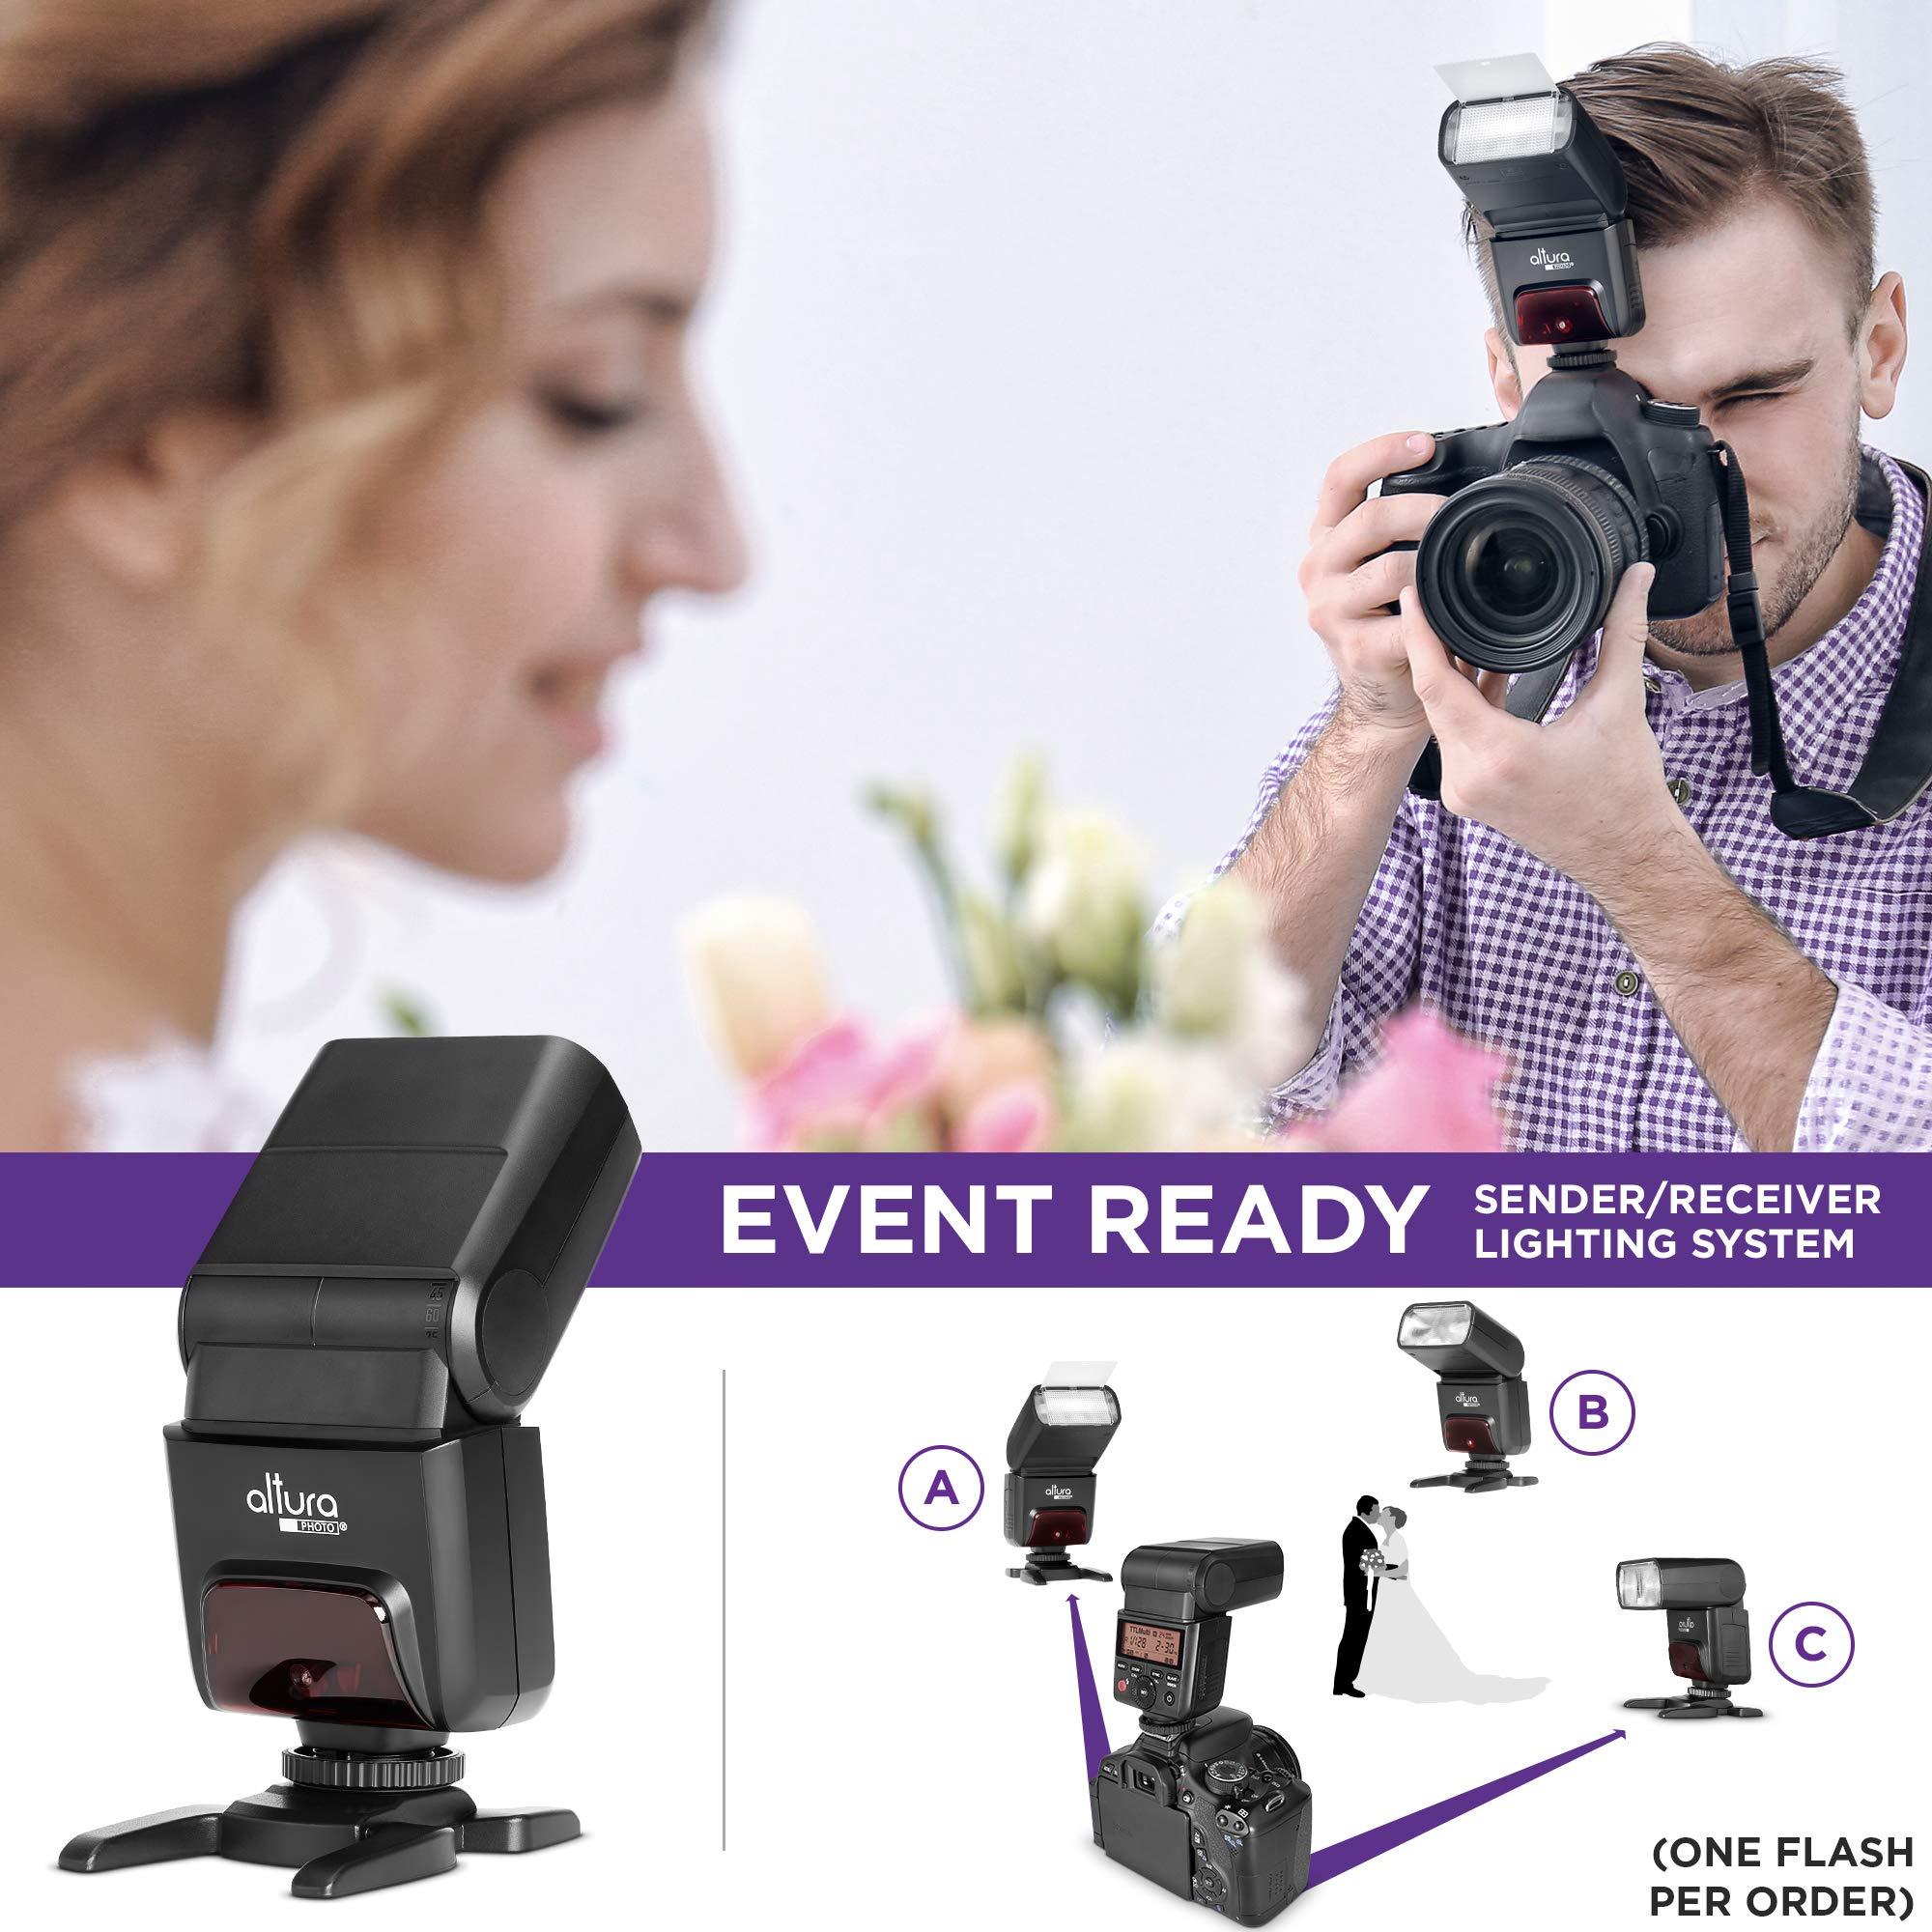 Amazon Com Camera Flash Speedlite Altura Photo Ap 305c For Canon Eos R Rp 90d 80d 70d Sl3 Sl2 Rebel T7 T7i T6 T6i 5d 6d 7d M5 M6 M50 M100 M200 2 4ghz E Ttl